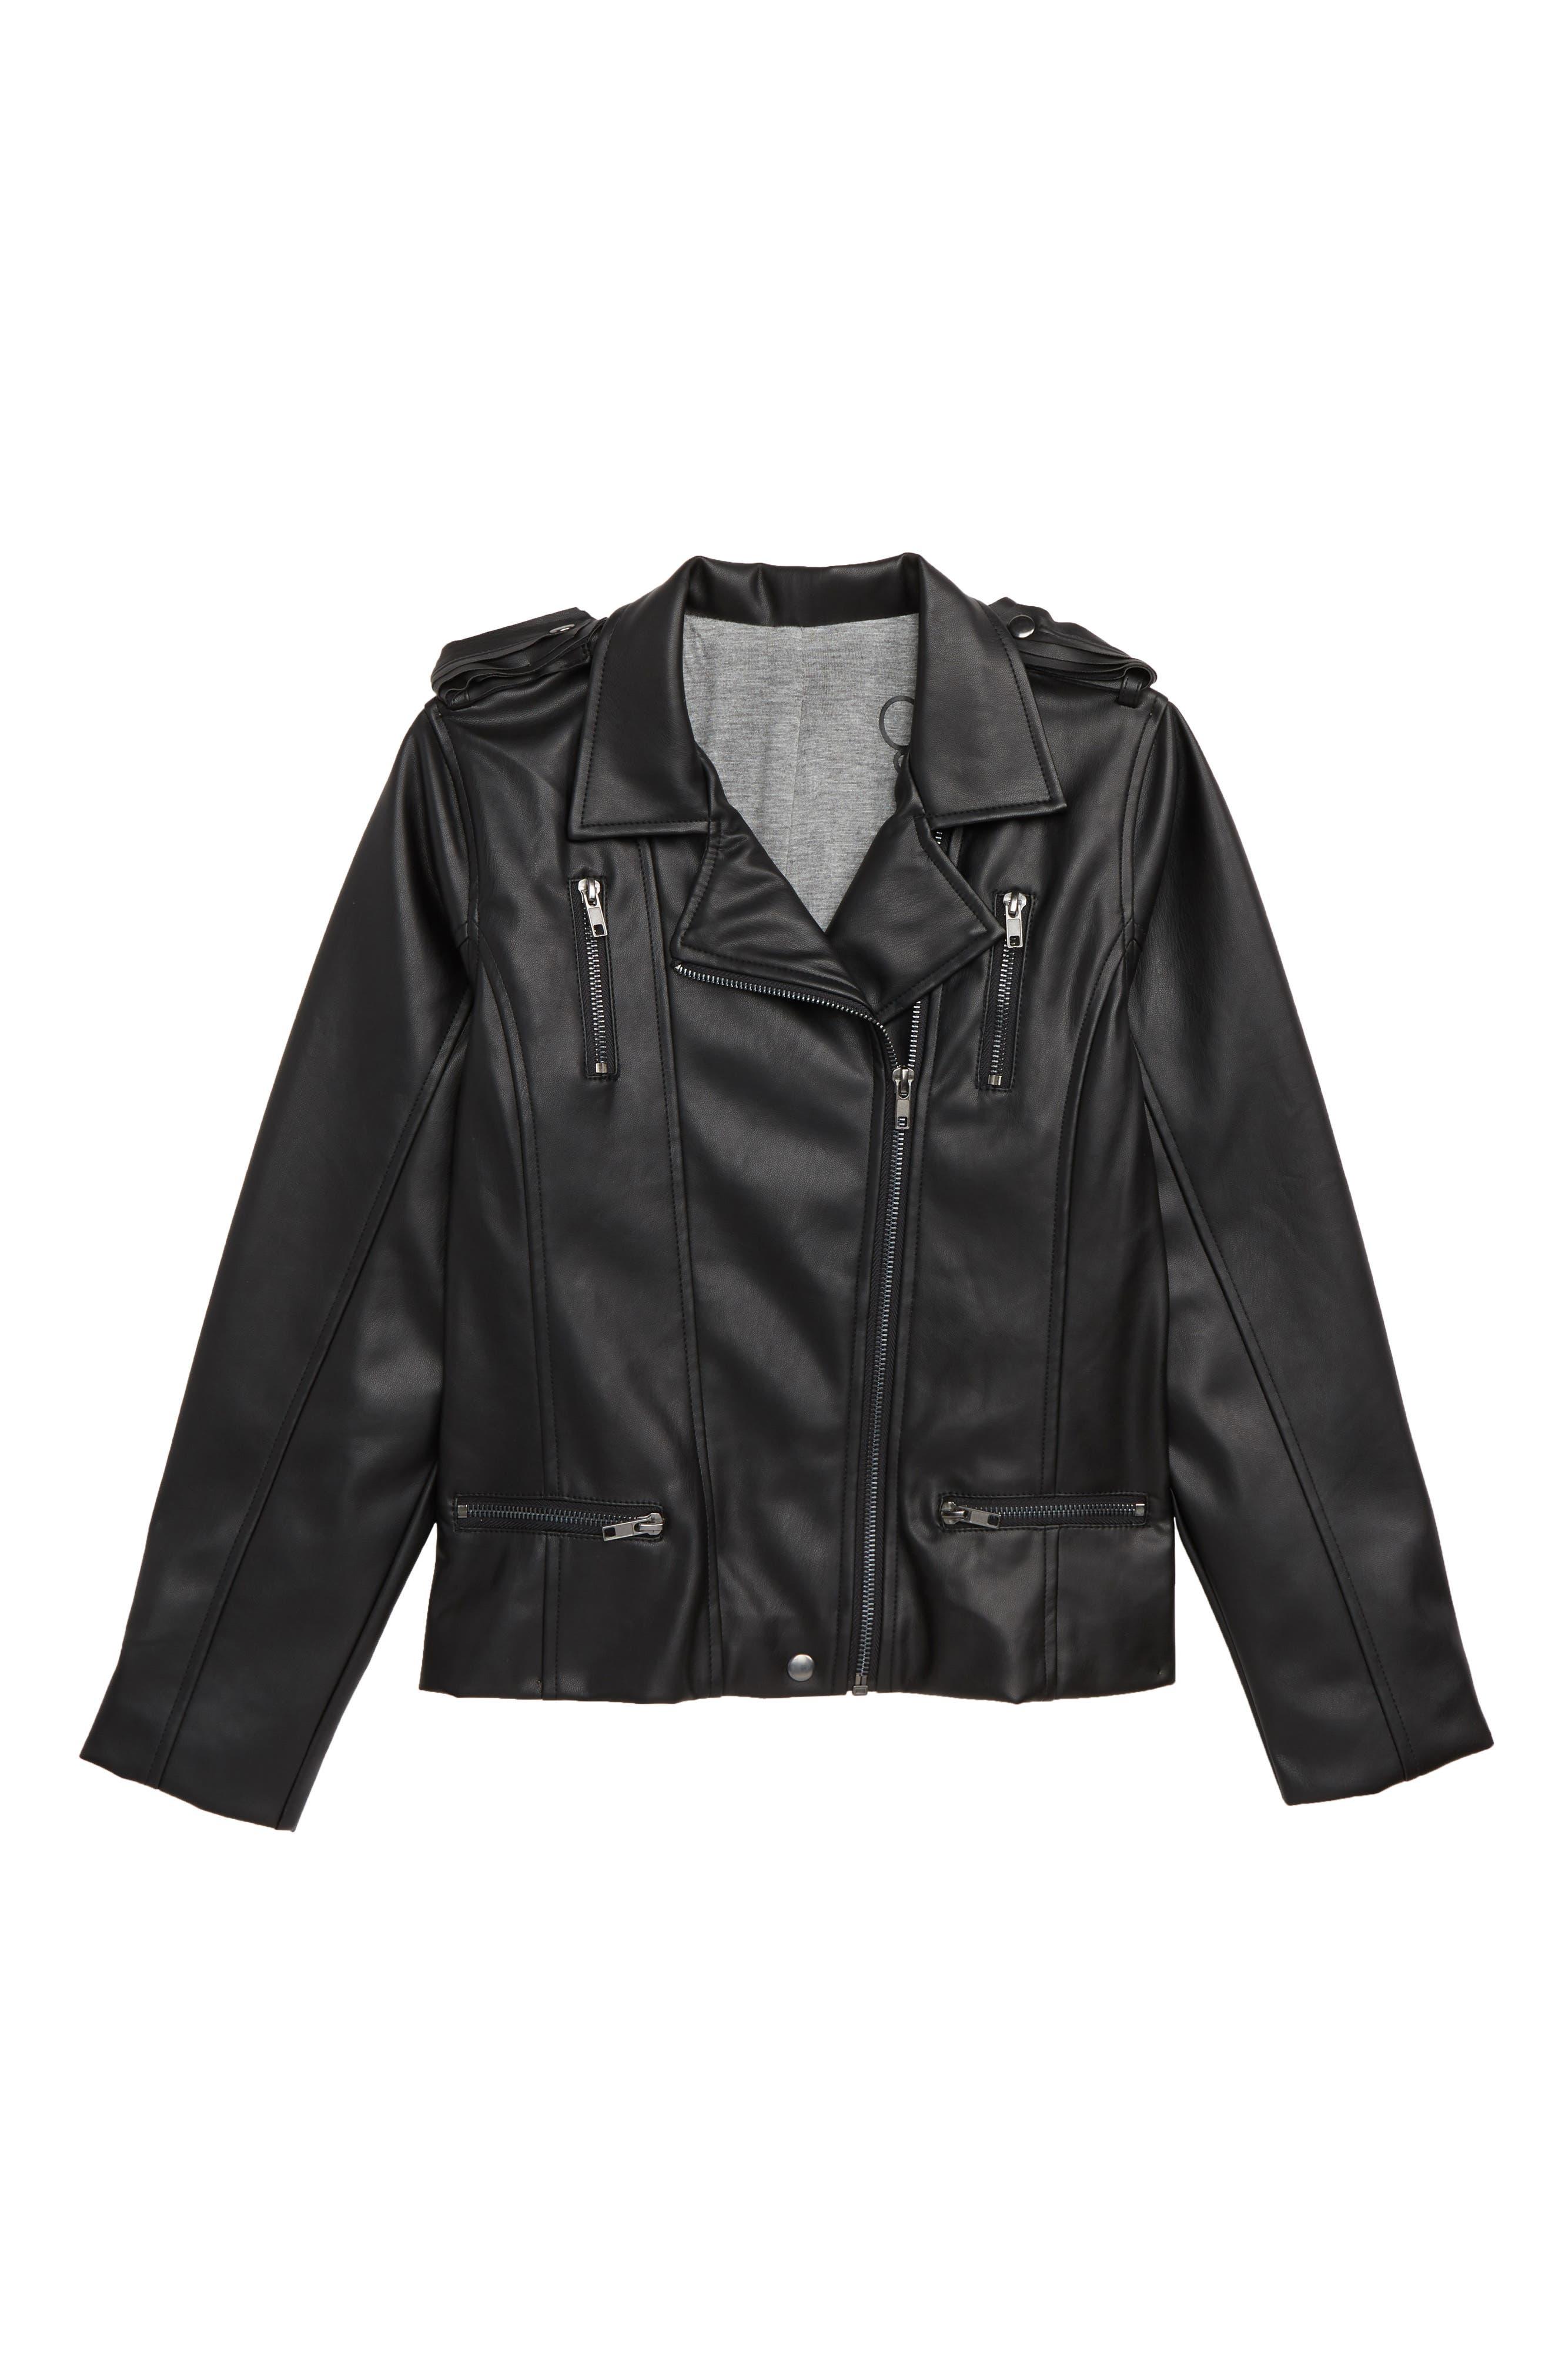 60a71f5c14c Leather jackets kids